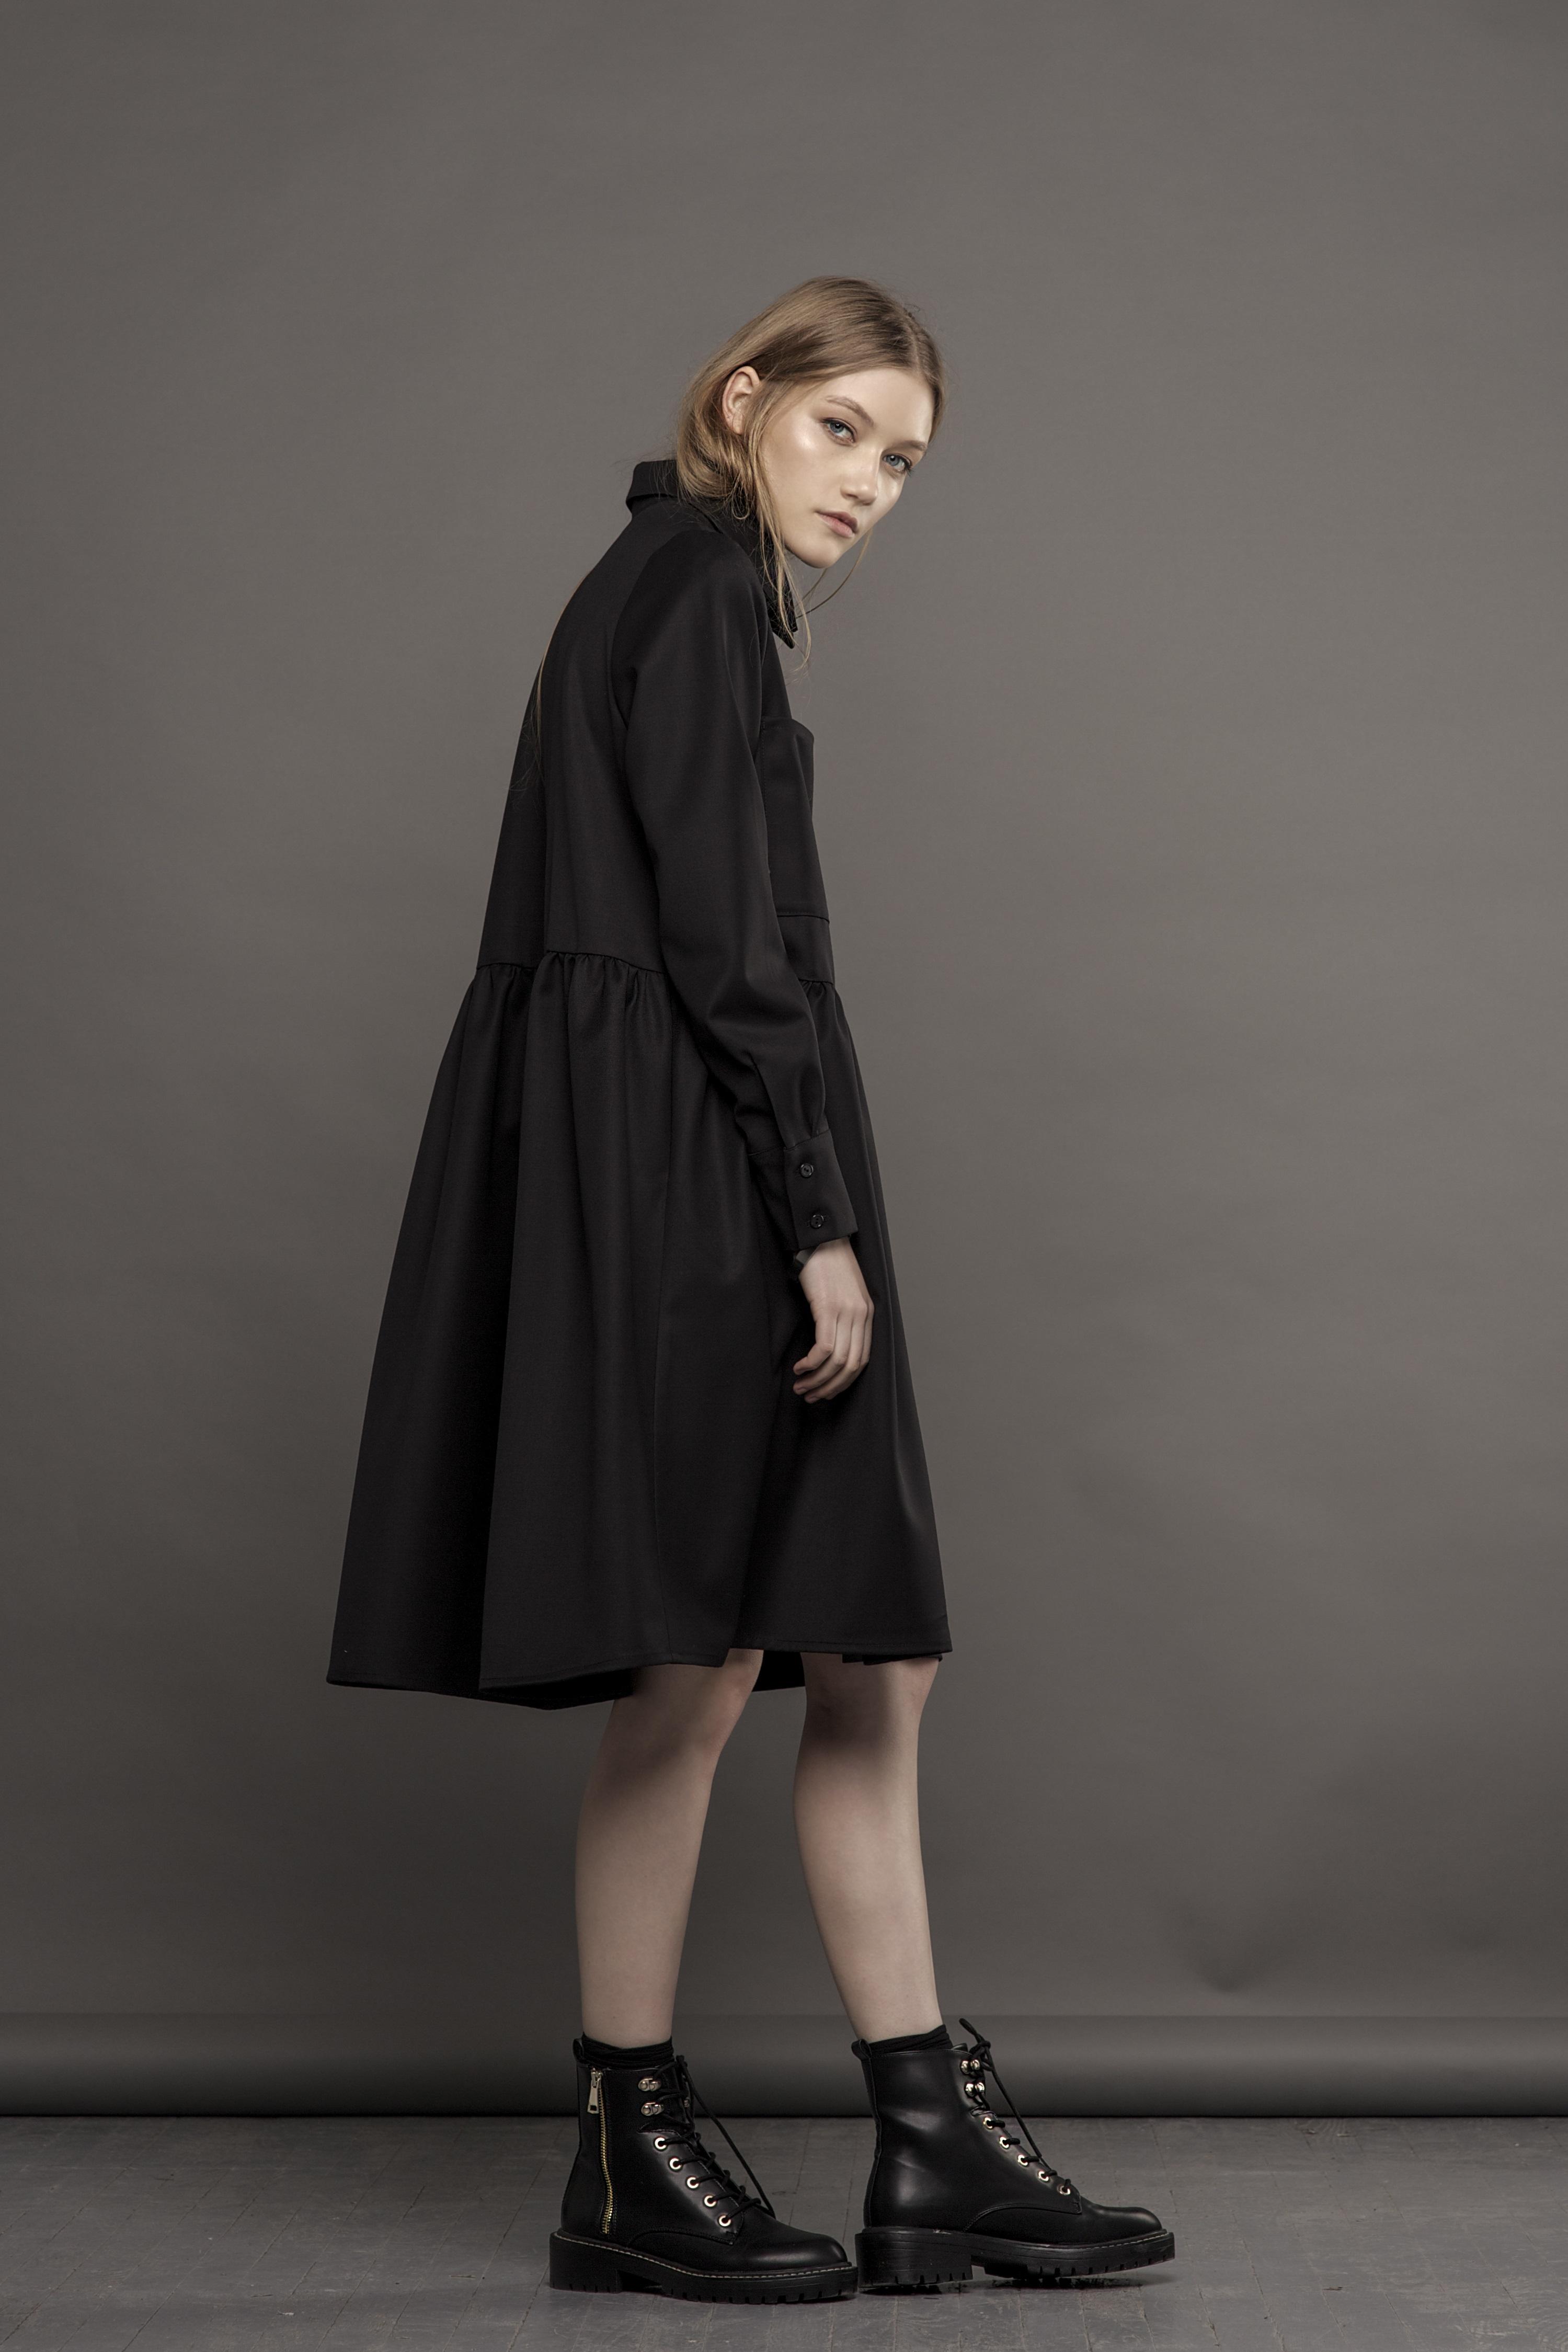 afe6fe41da5 new shirt-dress with pockets - Diana Paukstyte